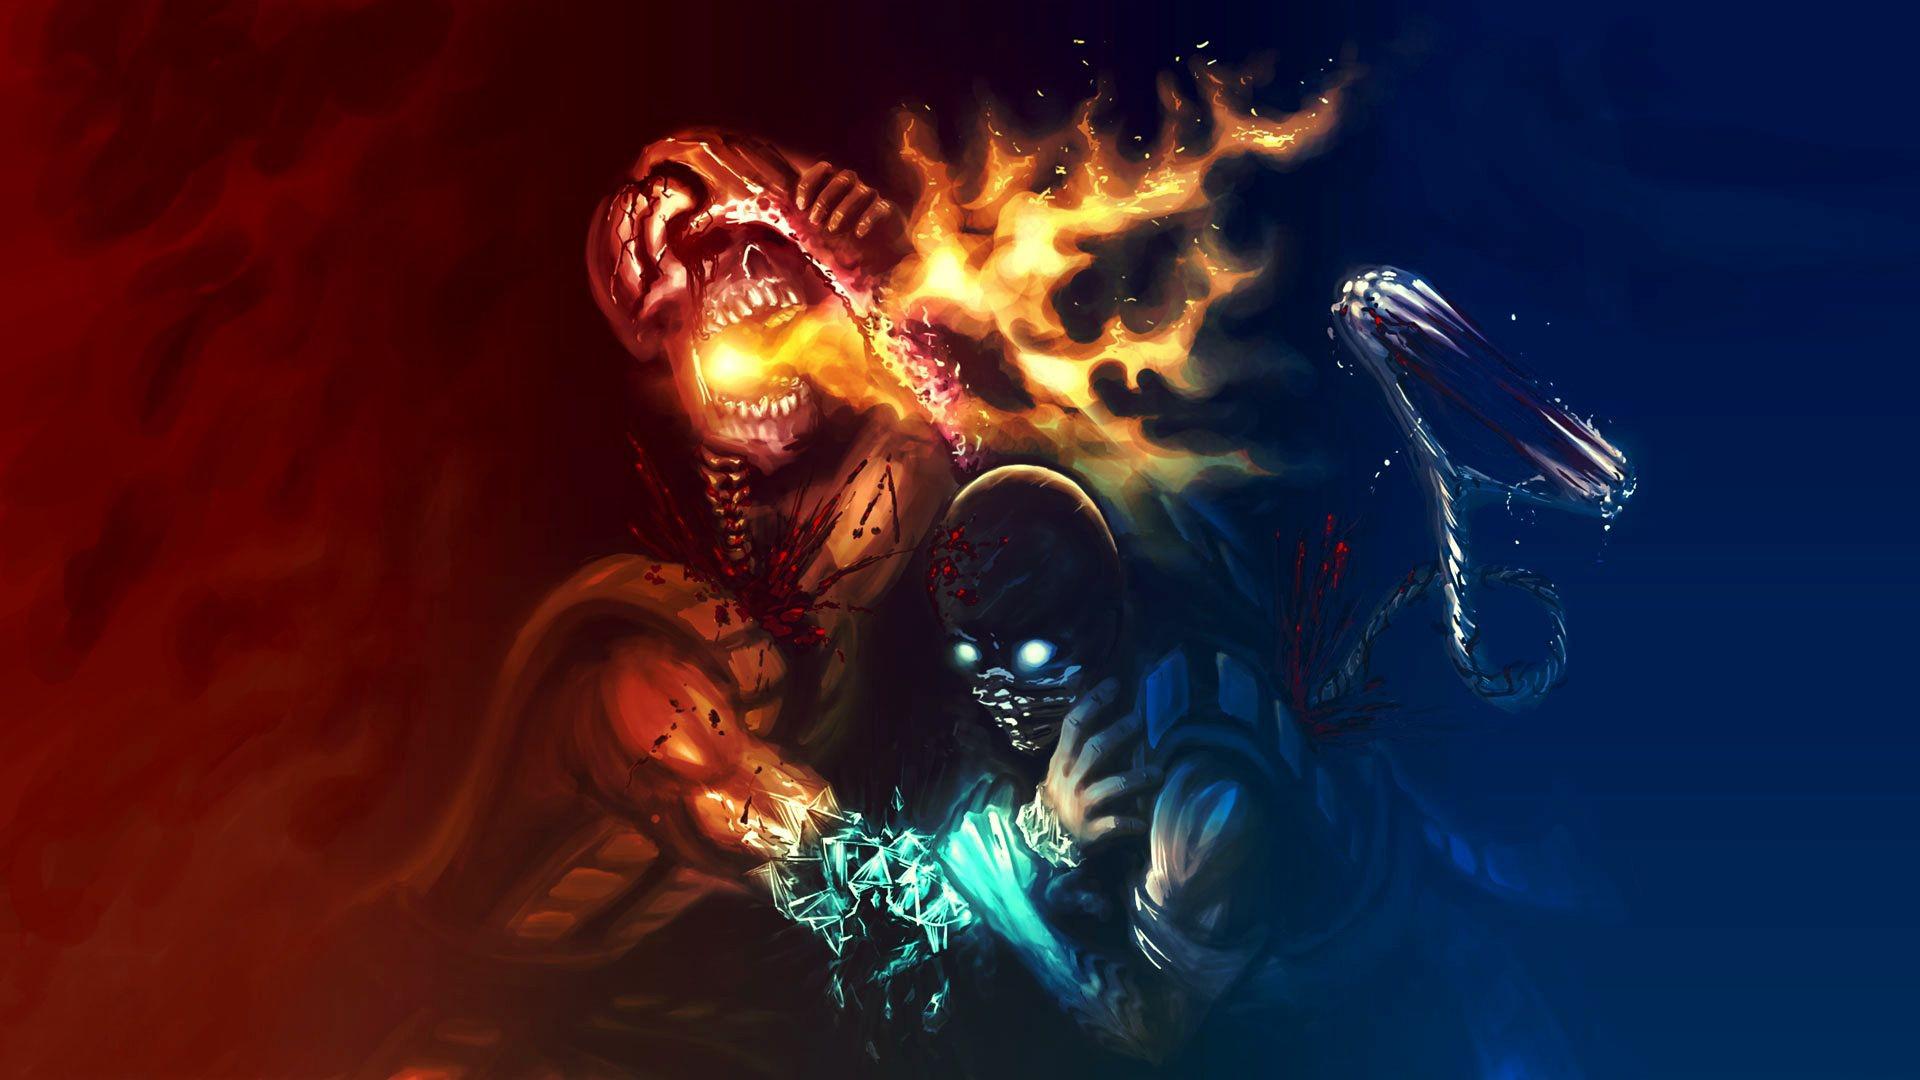 54 Scorpion Mortal Kombat Hd Wallpapers: Awesome Mortal Kombat Wallpapers